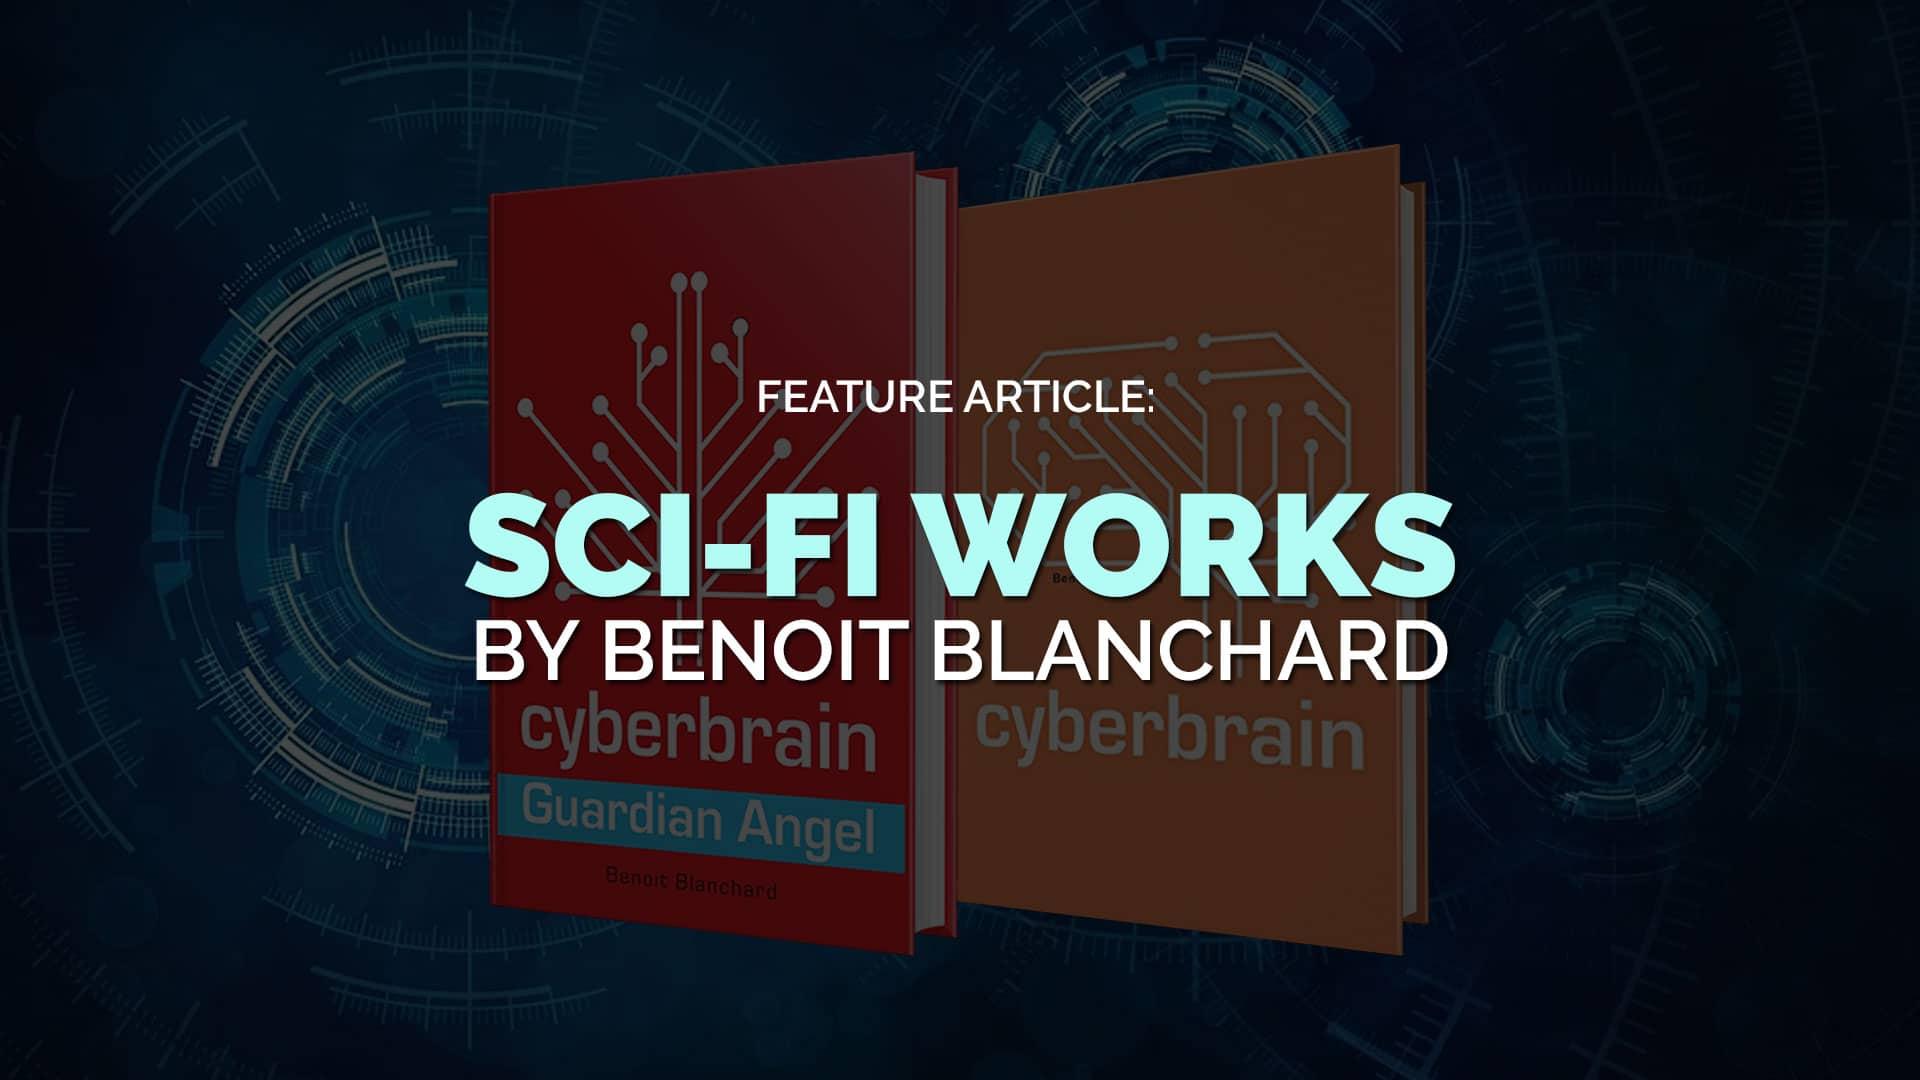 Sci-fi-Works-by-Benoit-Blanchard banner